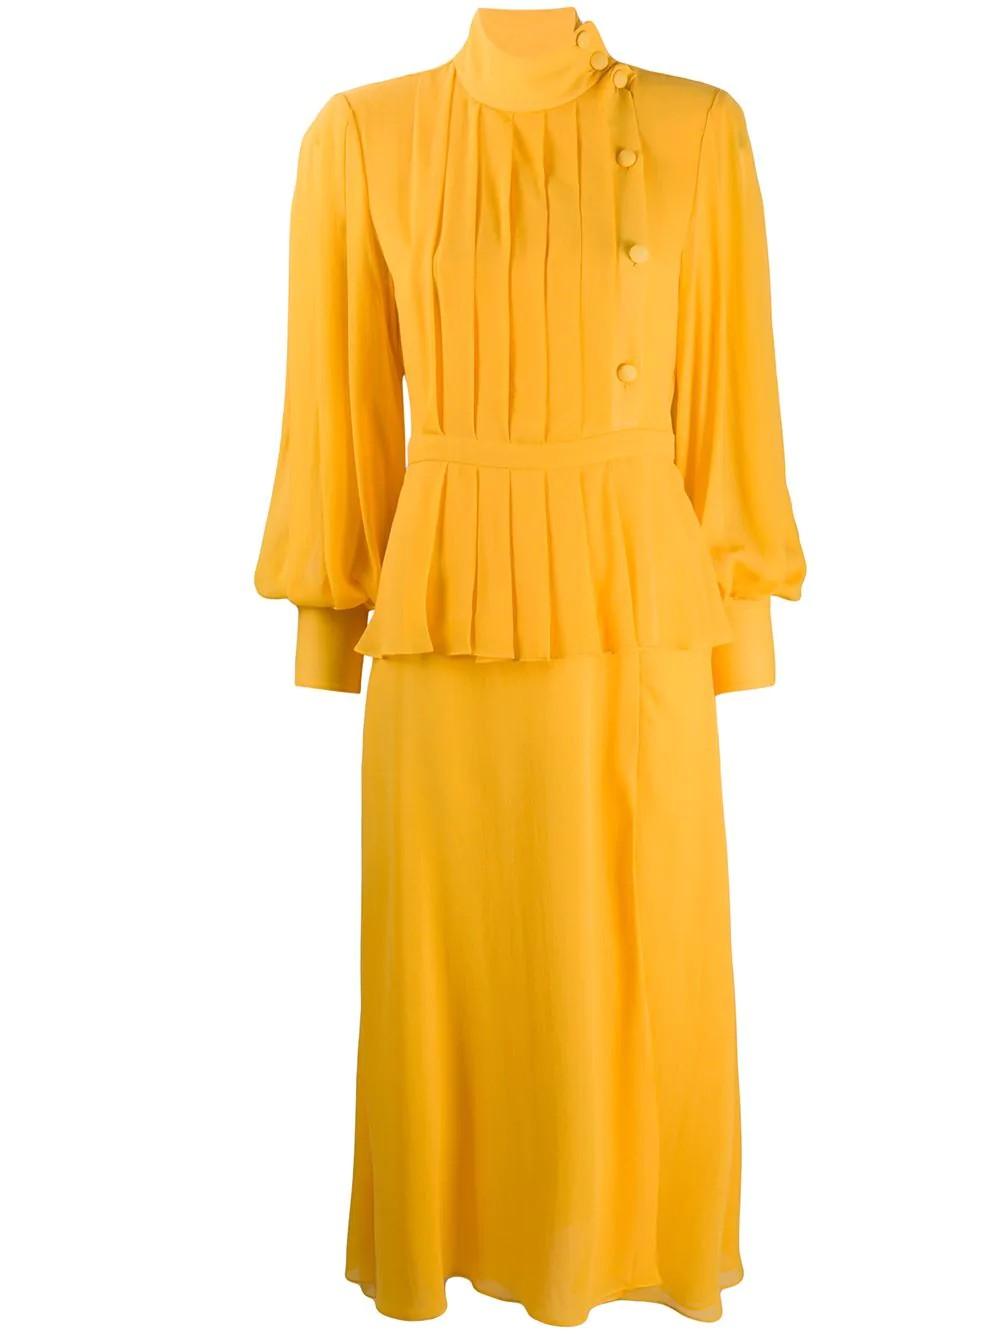 SILK GEORGETTE PLEATED DRESS WITH PEPLUM